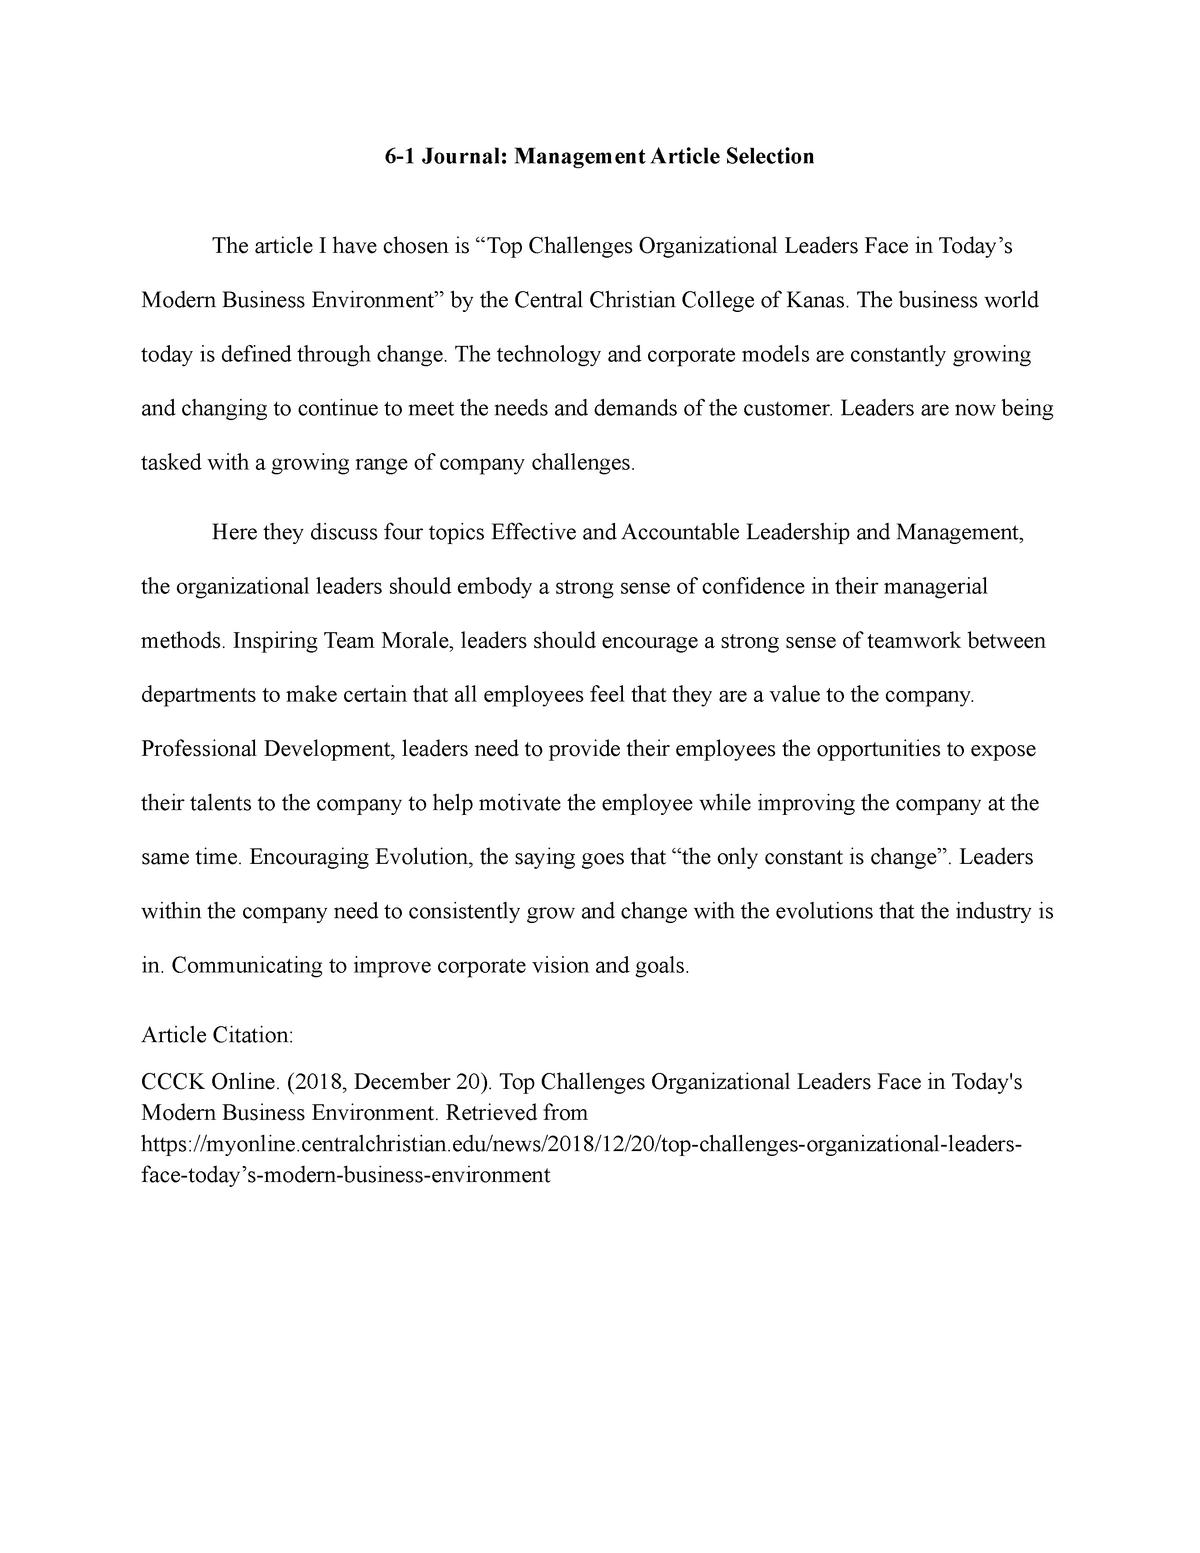 6 1 Journal Management Article Selection Spt200 Snhu Studocu